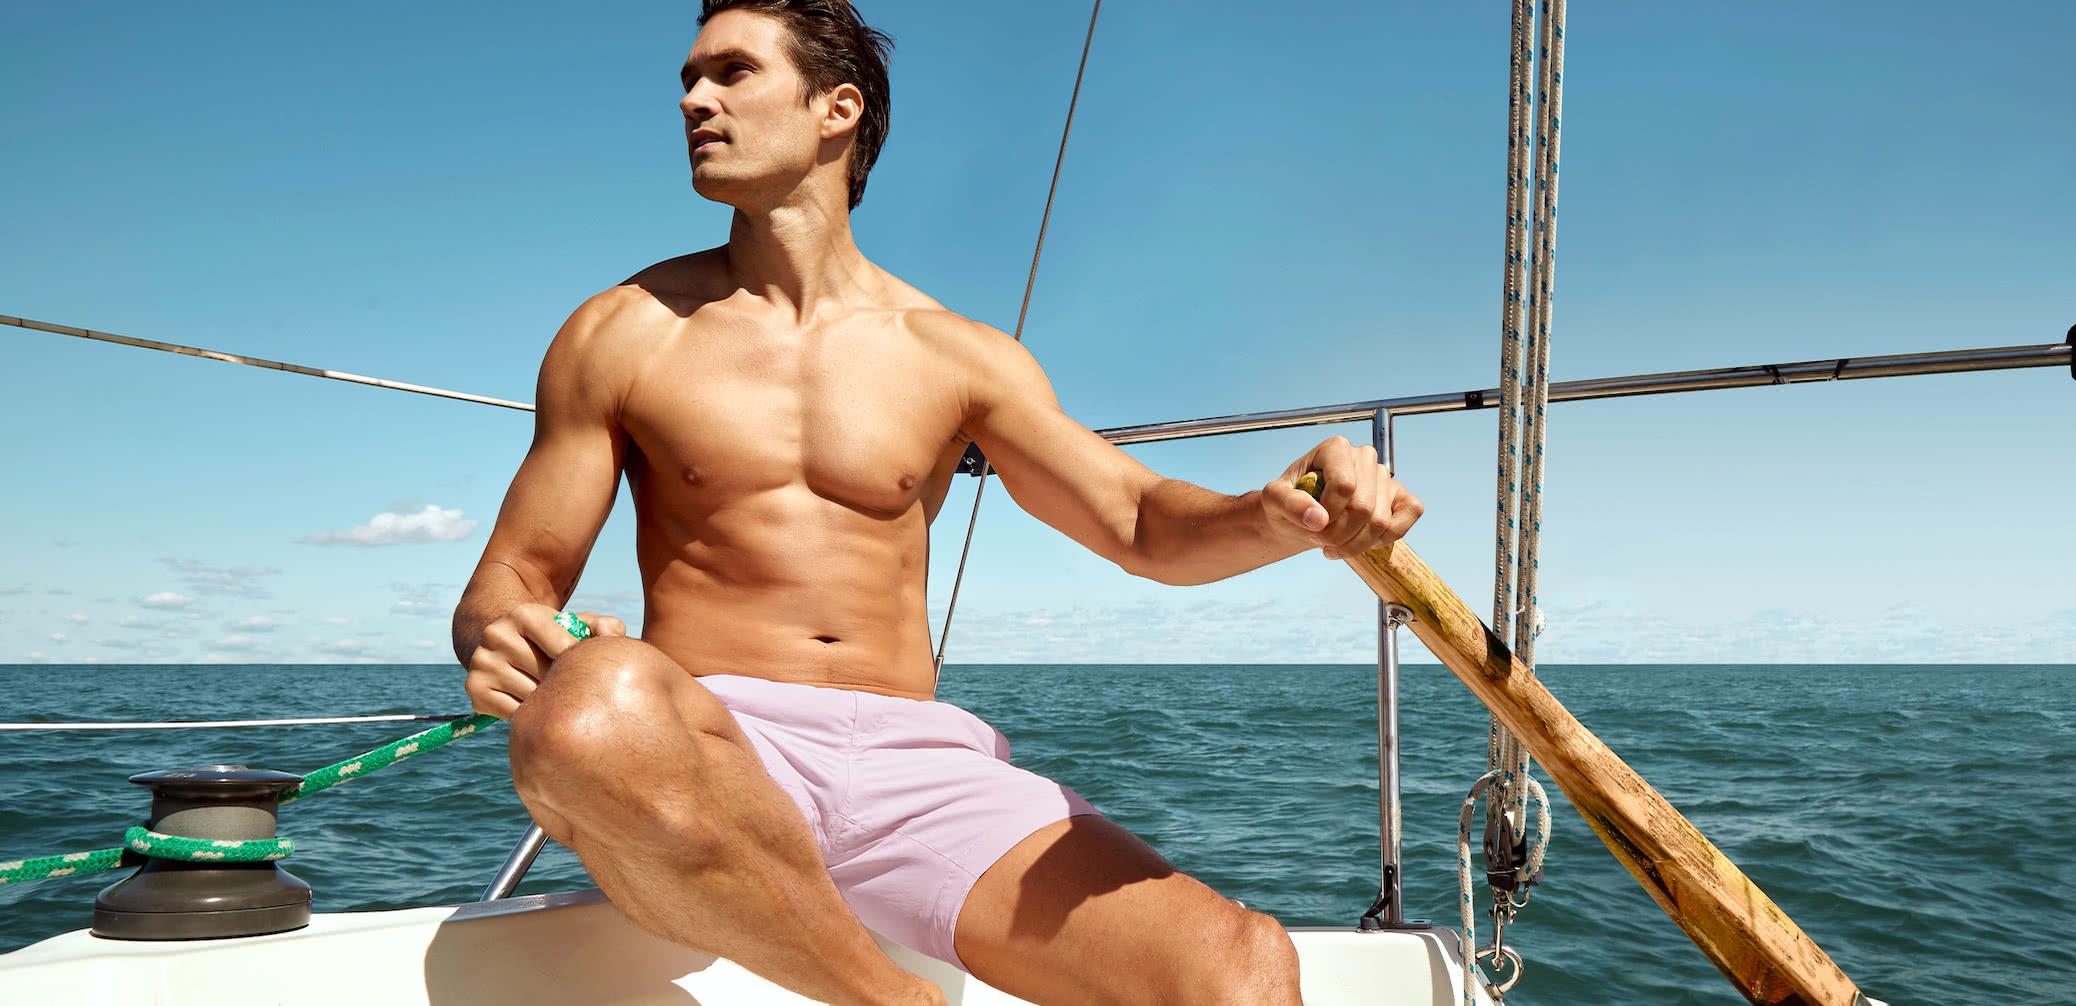 Top 10 Best Men's Swimwear: Swim Shorts, Trunks, Board Shorts – Style –  News – Luxury Travel Diary